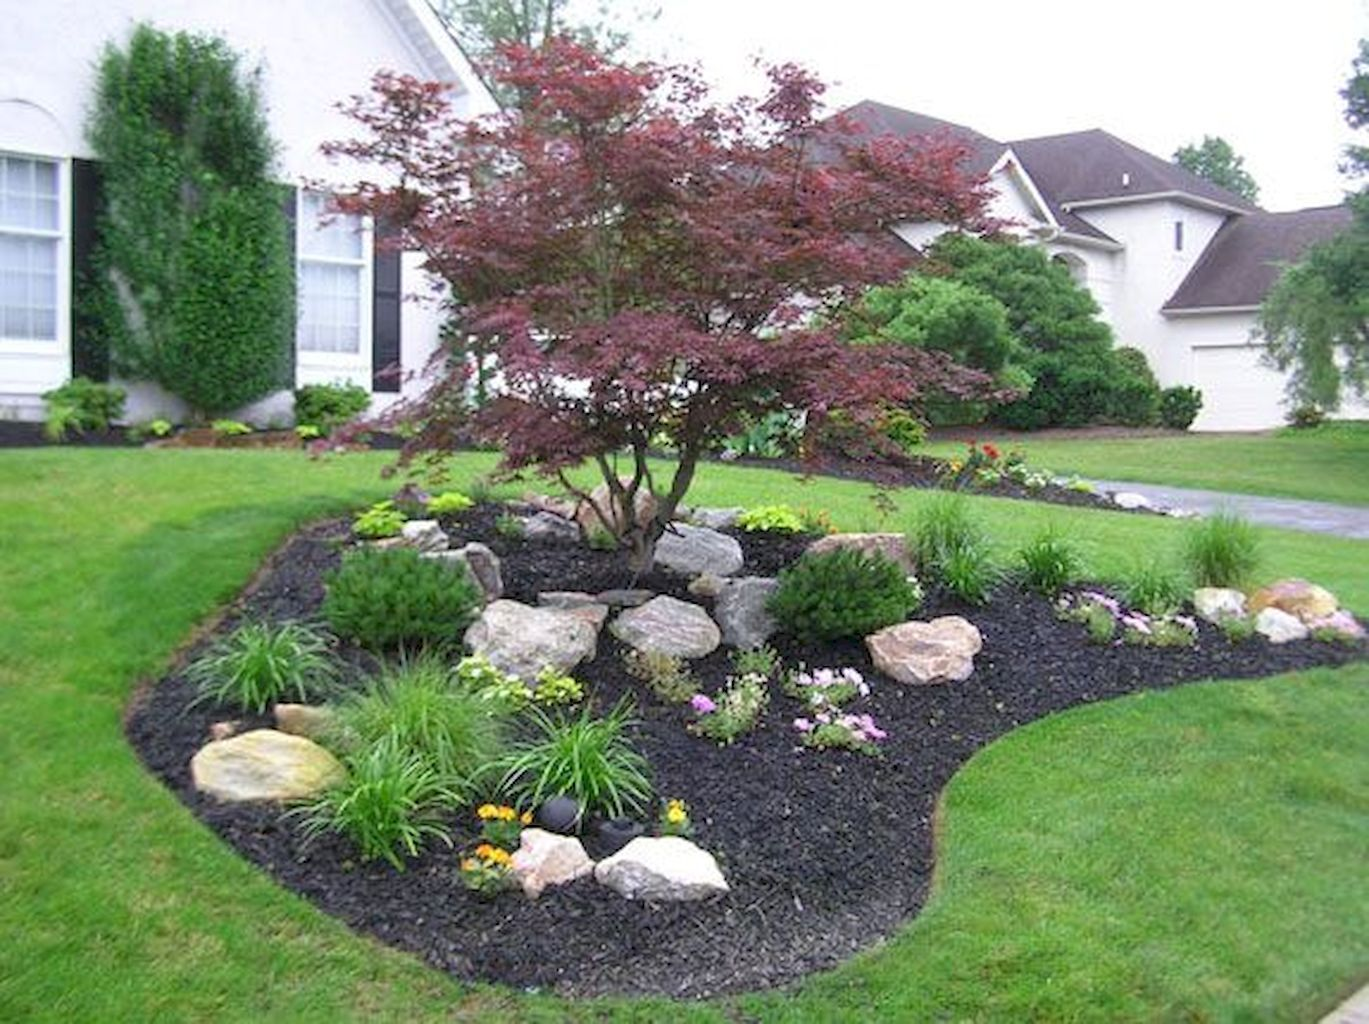 47 gorgeous front yard garden landscaping ideas on front yard landscaping ideas id=46419